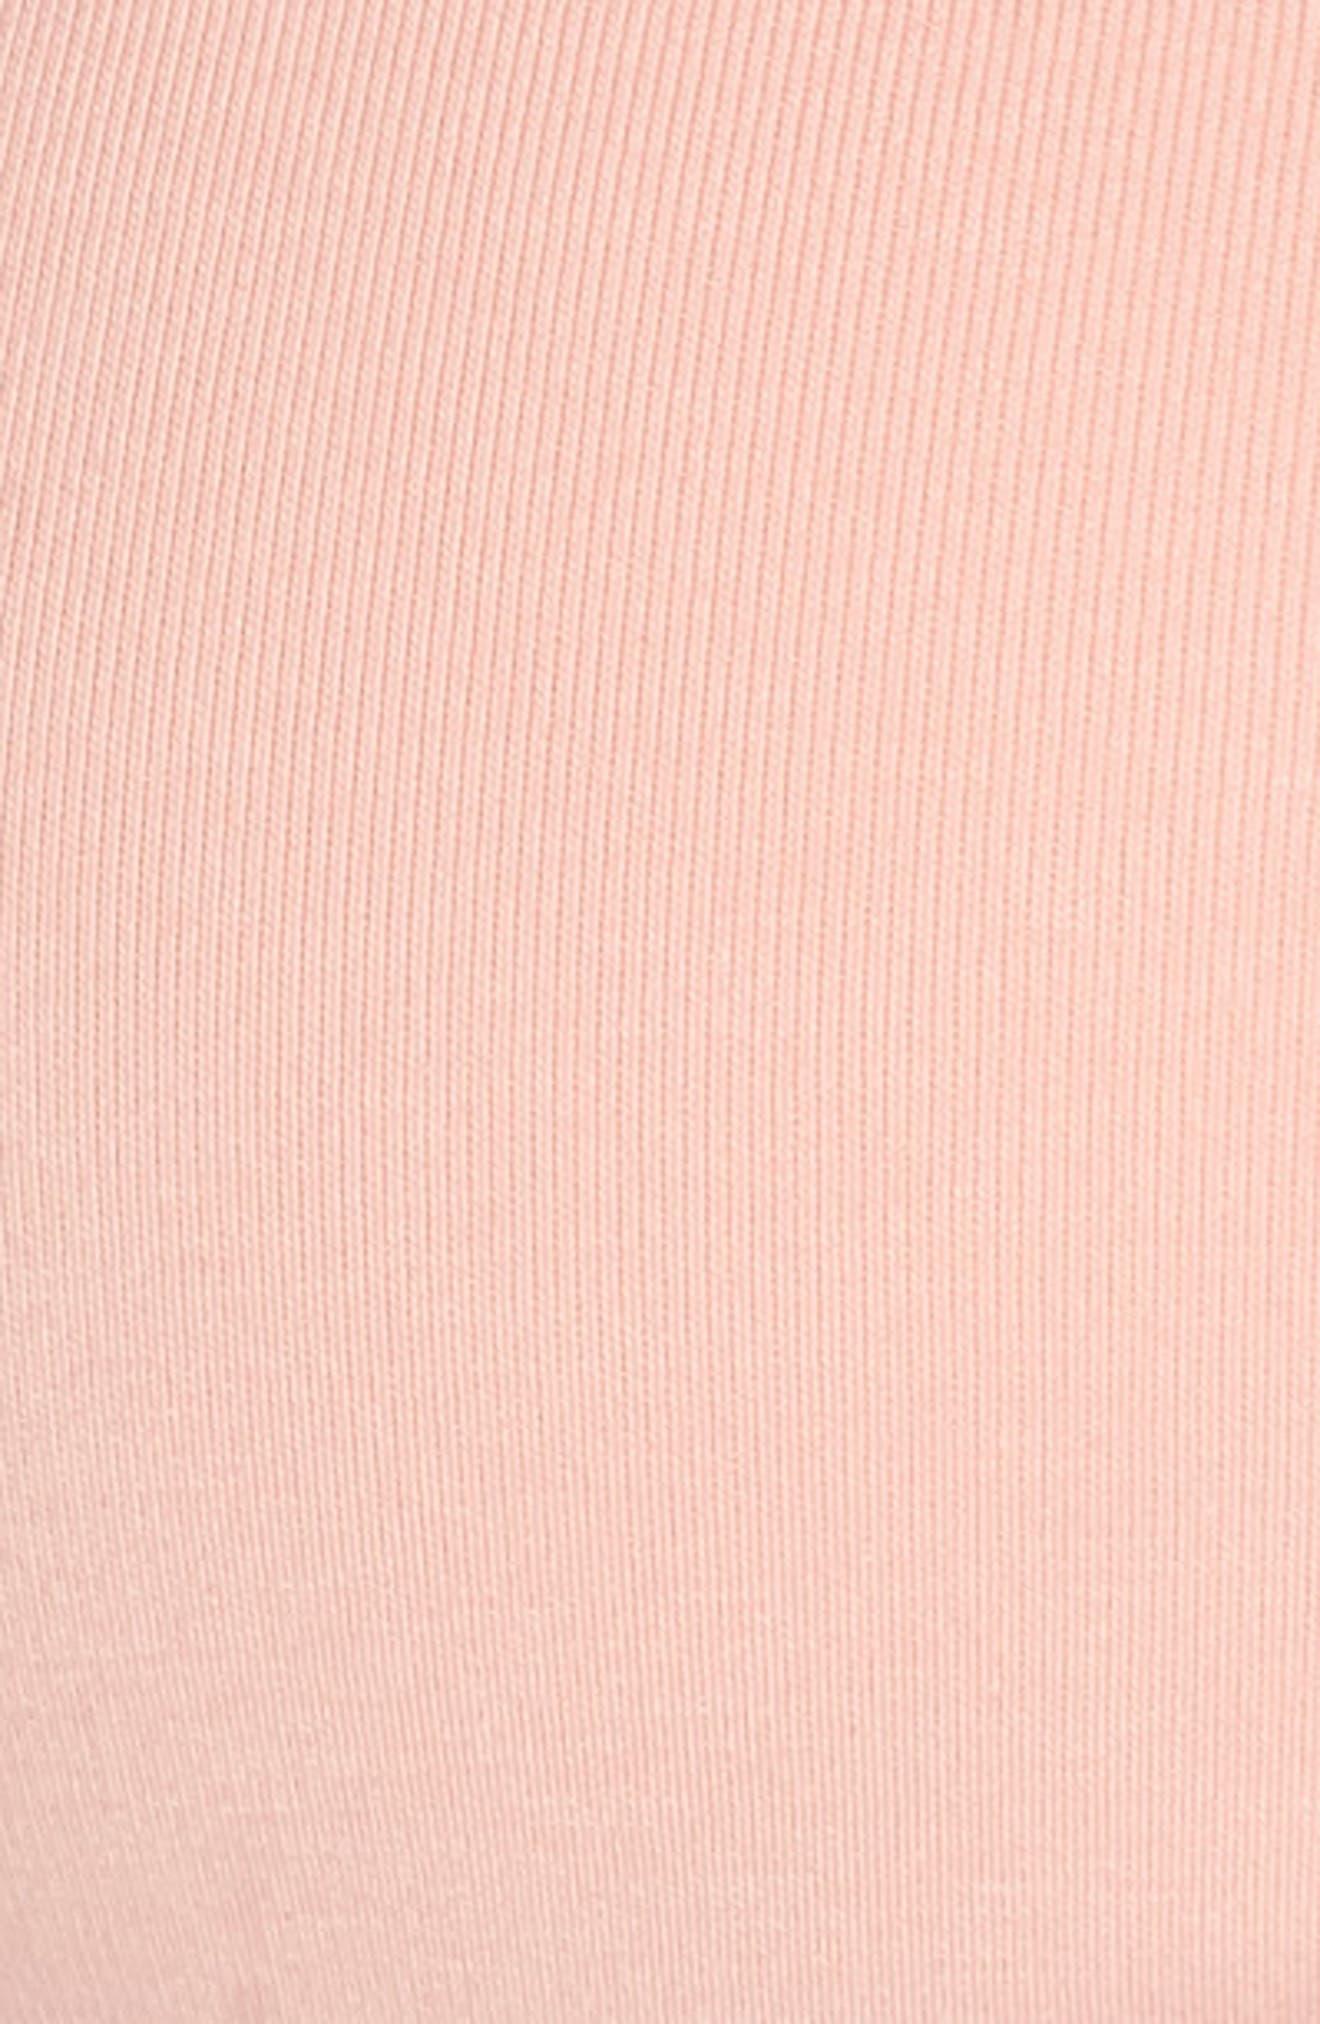 NIKE, Classic Soft Sports Bra, Alternate thumbnail 6, color, STORM PINK/ BLACK